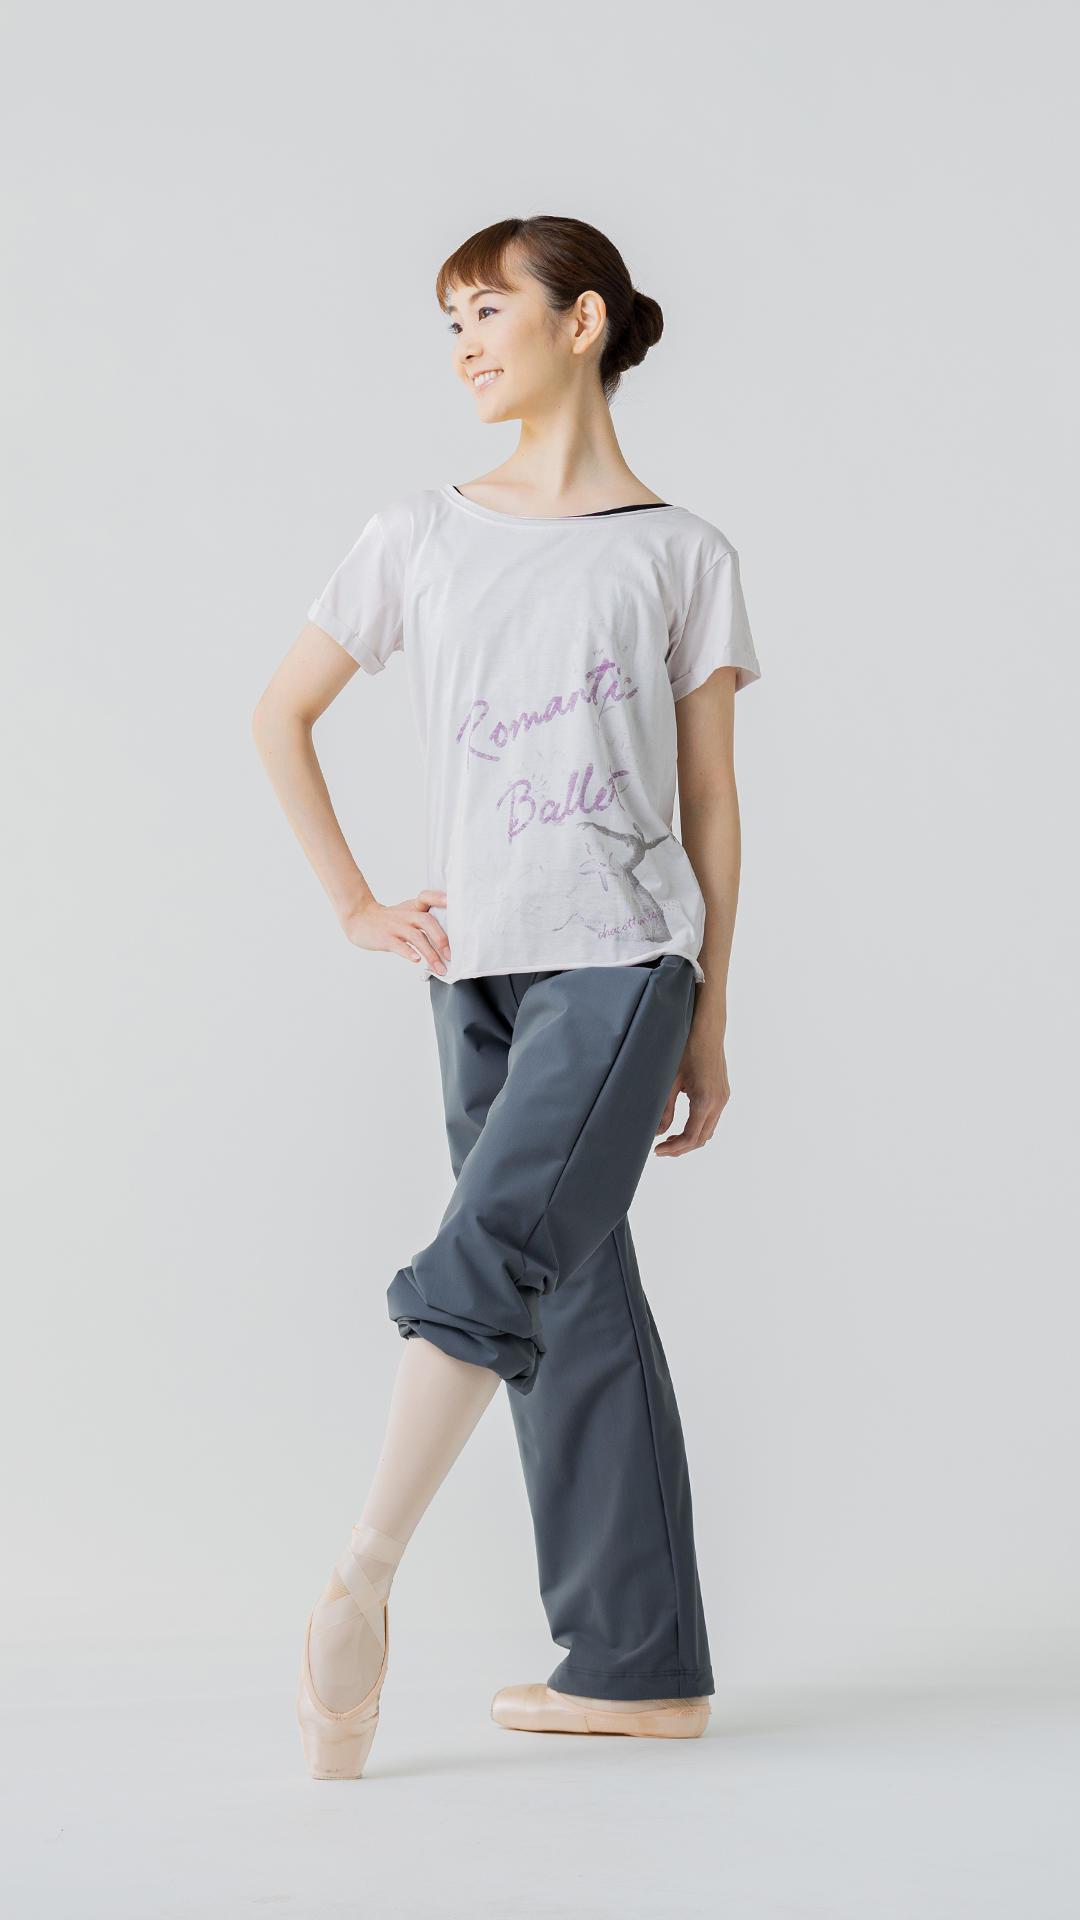 0729_t_shirt_9.jpg